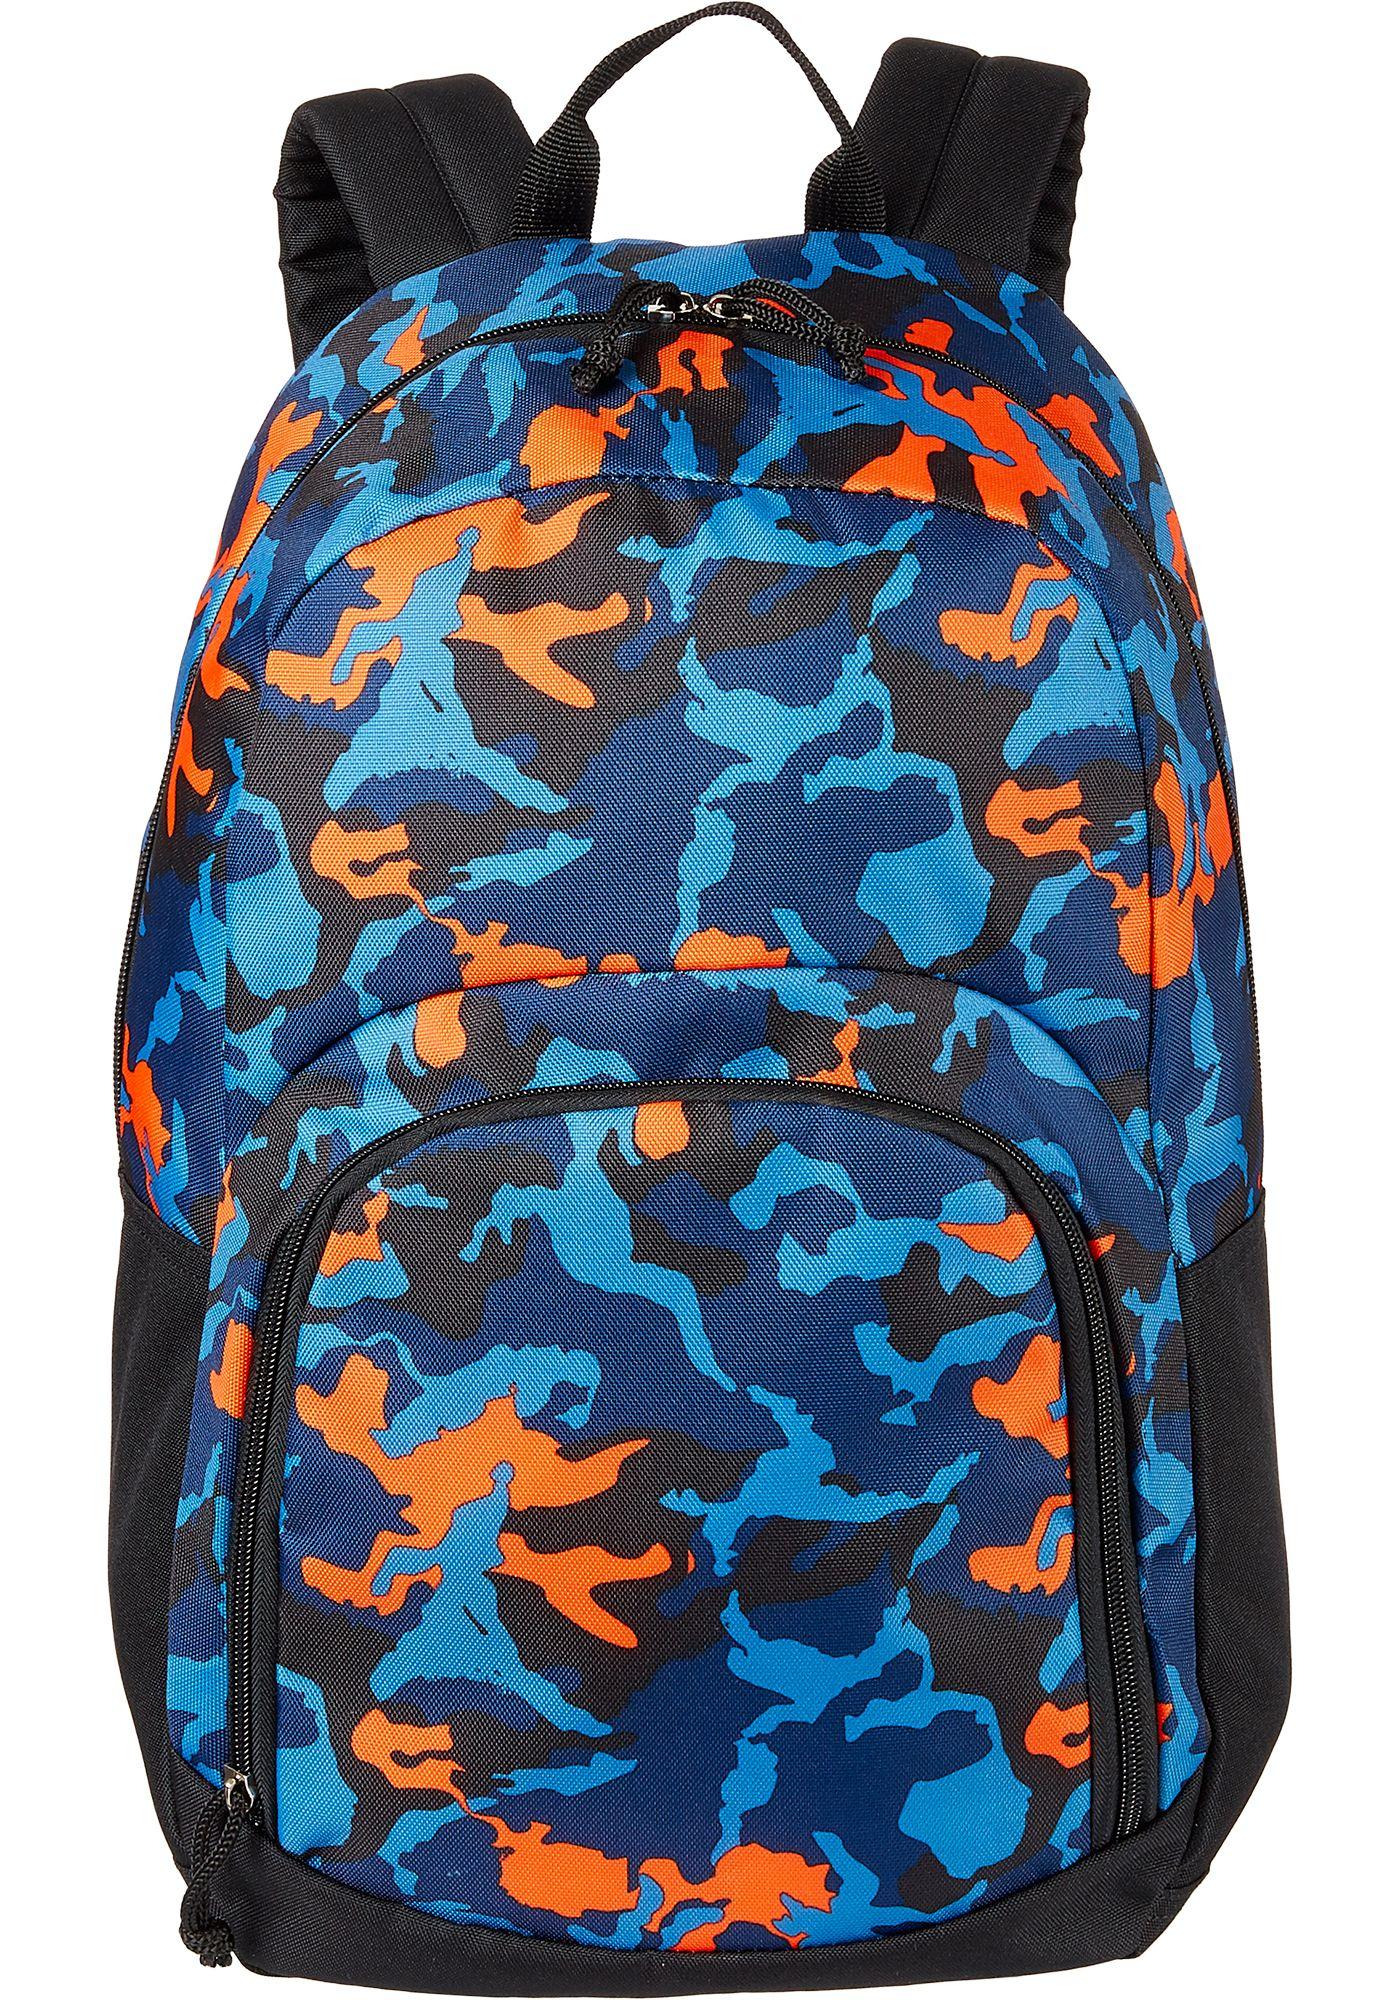 DSG Adventure Backpack